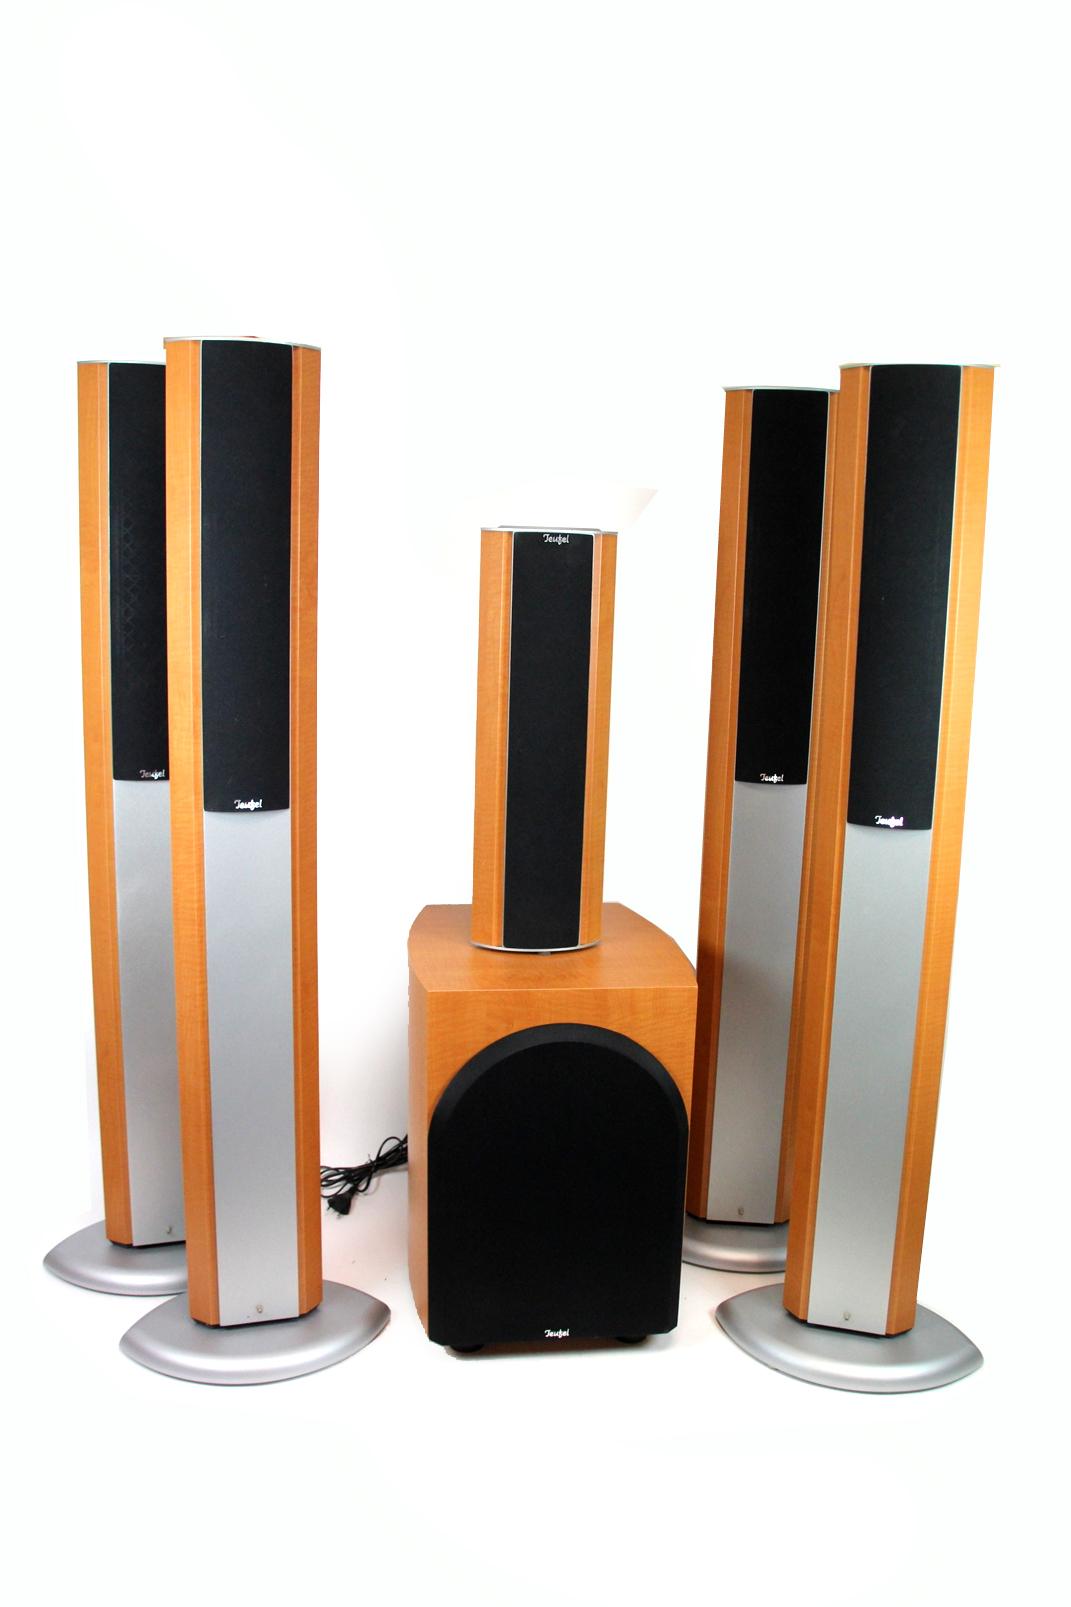 teufel concept r lautsprechersystem 5 1 surroundsystem. Black Bedroom Furniture Sets. Home Design Ideas